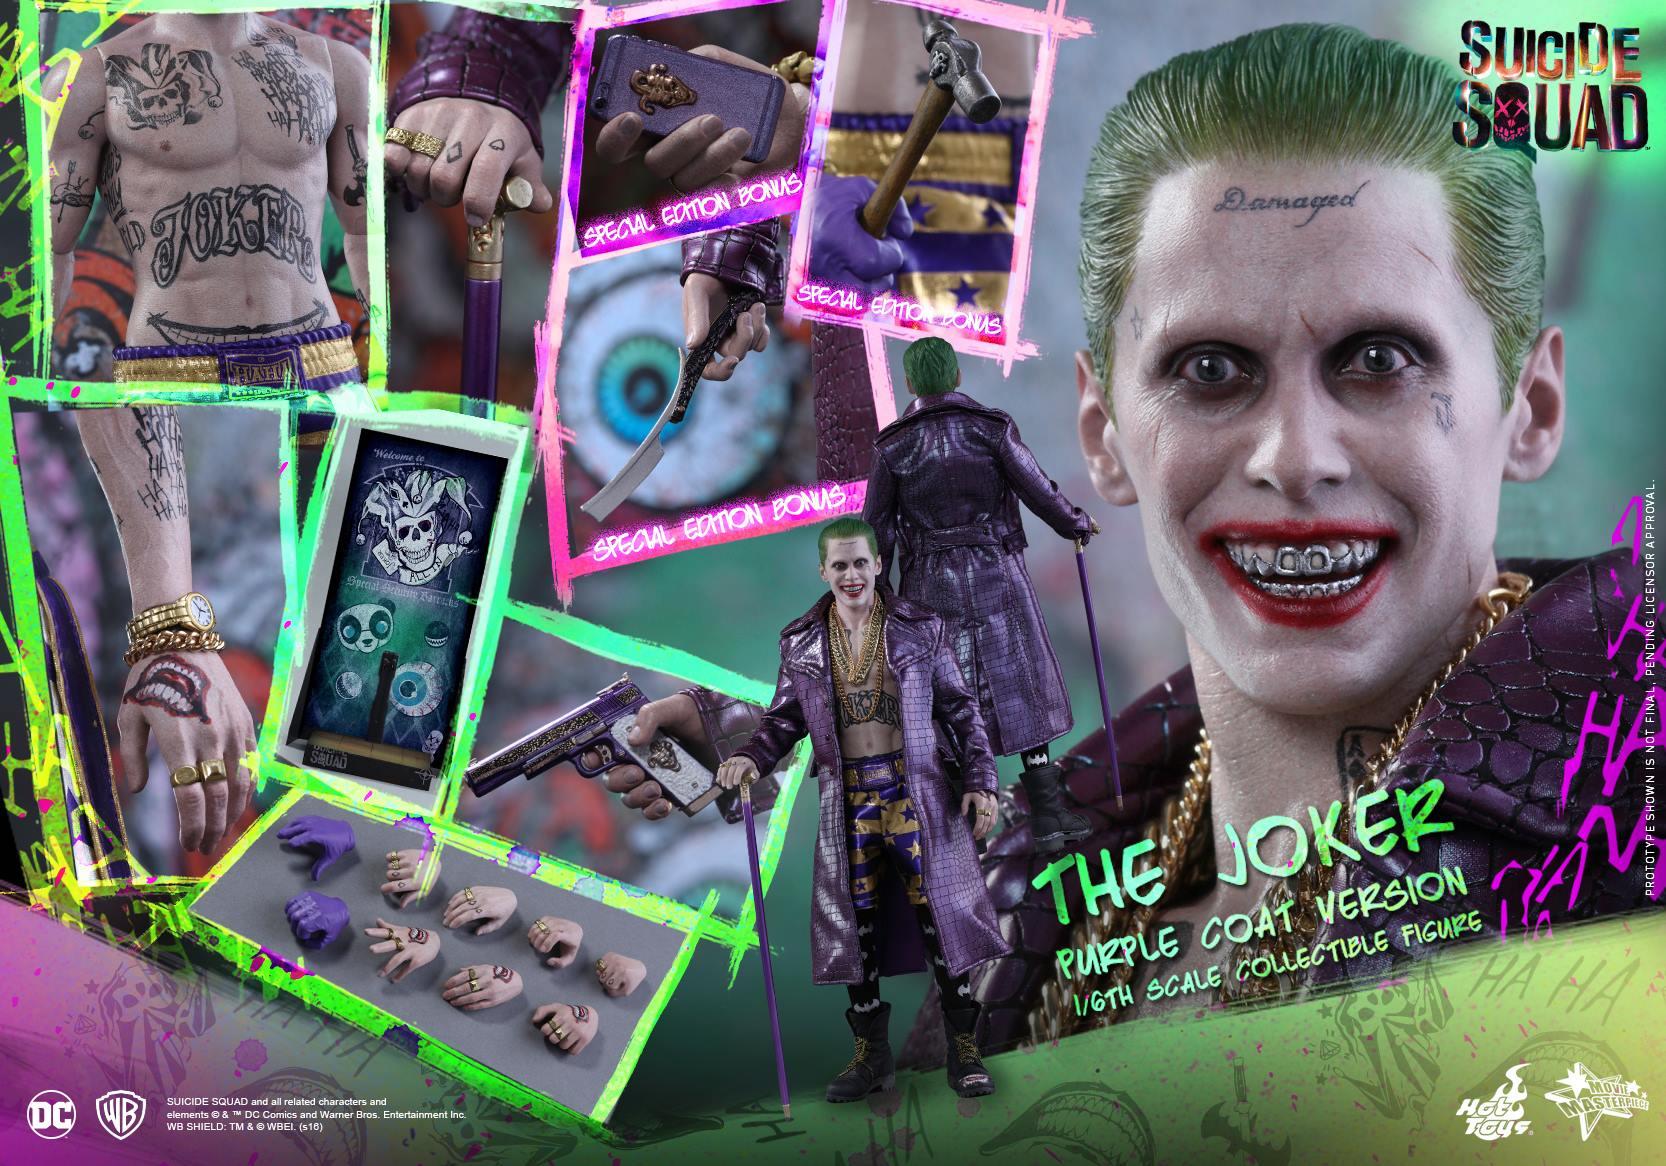 Hot-Toys-Suicide-Squad-Joker-Purple-Coat-19